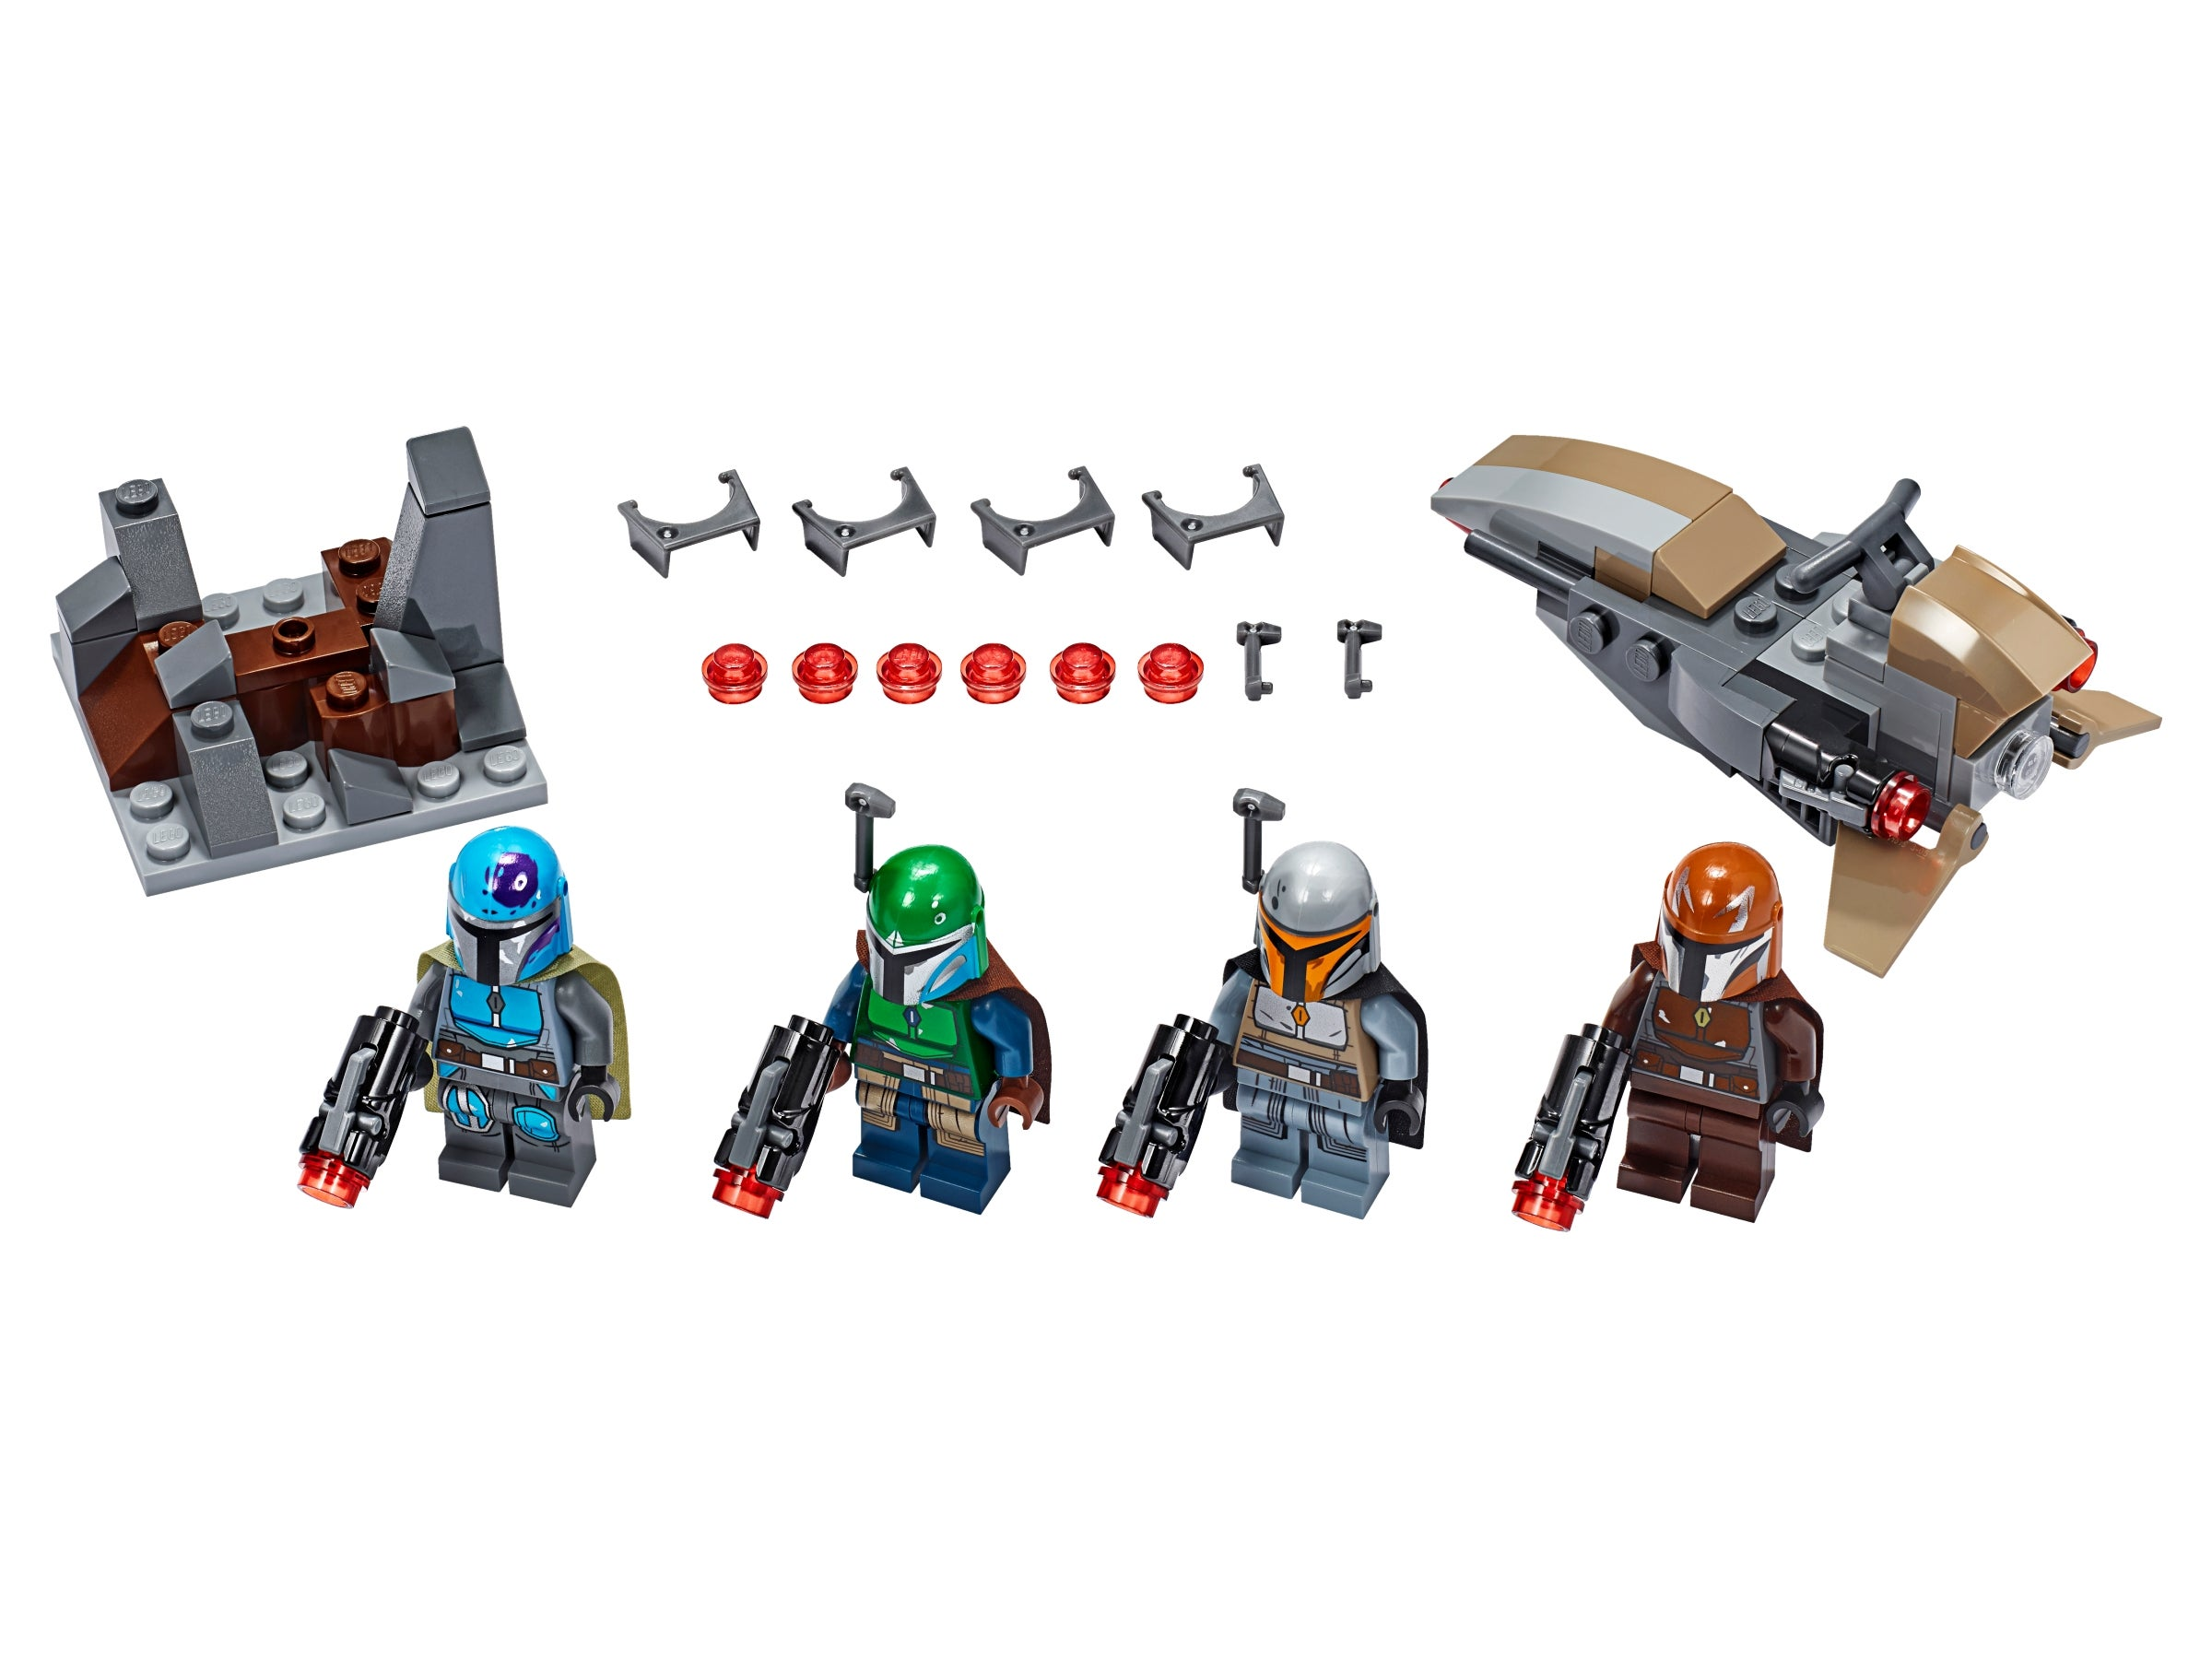 lot of 4 Star Wars Mandalorian minifigures 75267 GENUINE LEGO All 4 Colors